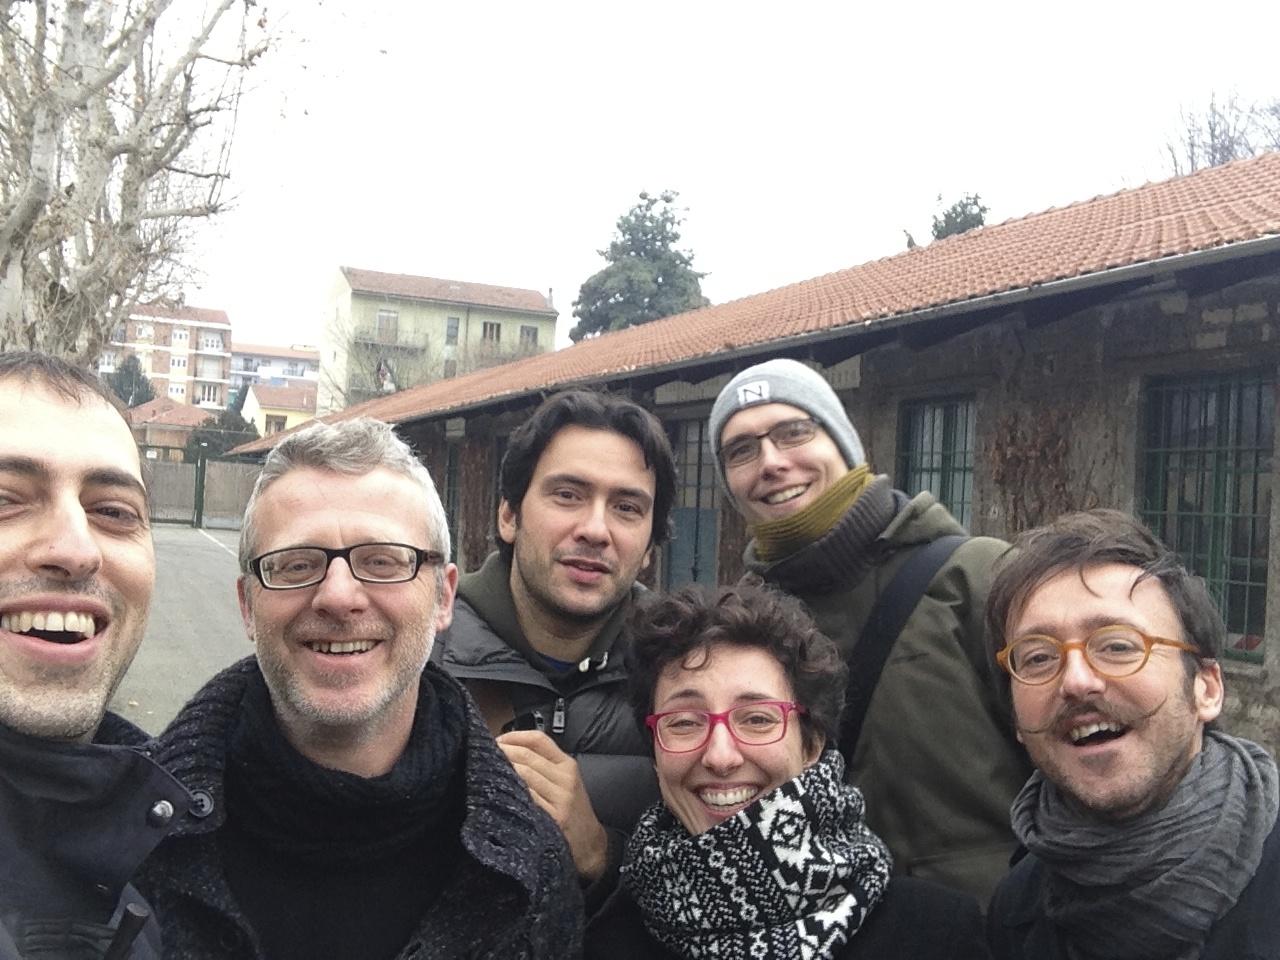 3quietmen meets Green Brotz Turin